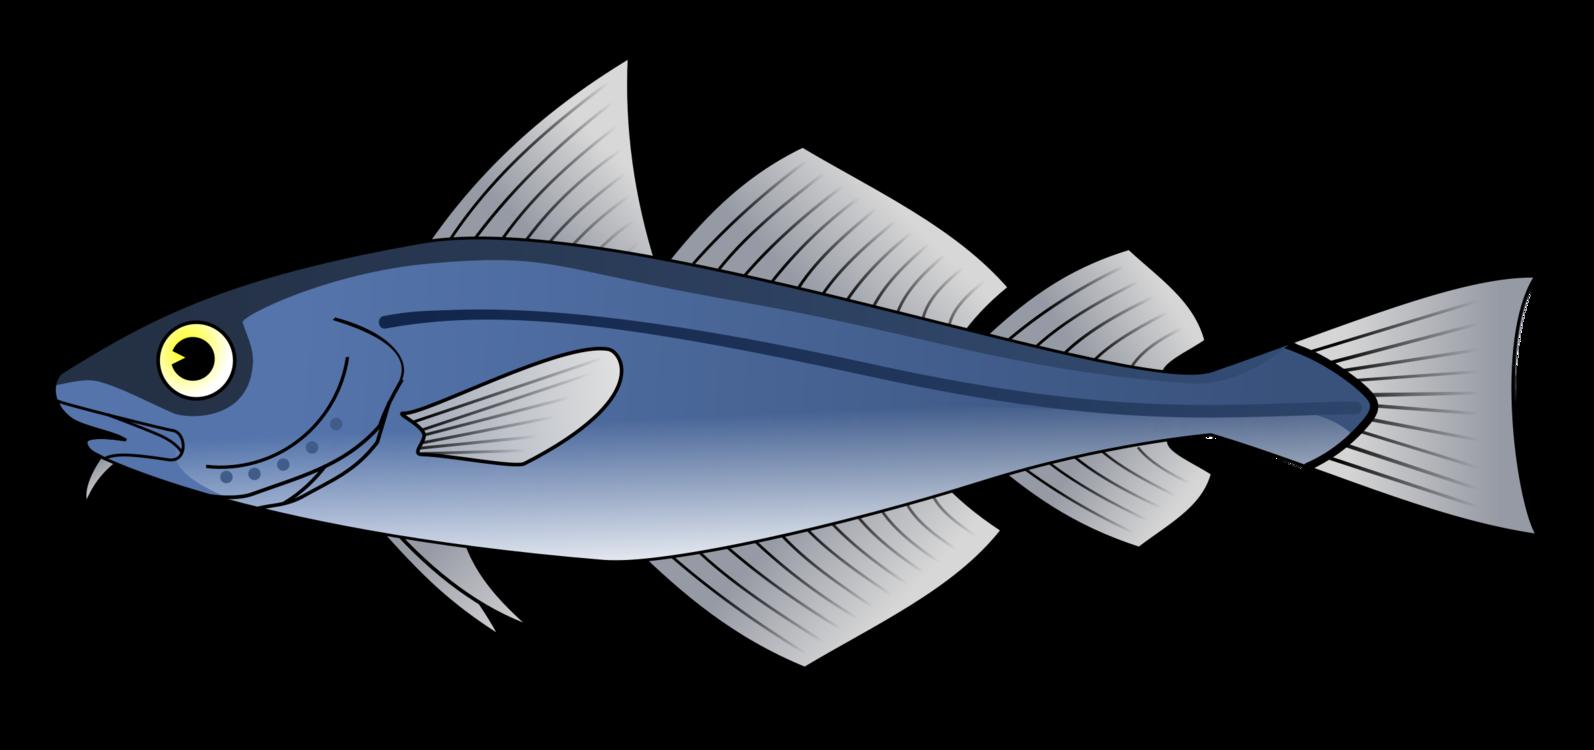 Marine Biology,Organism,Seafood